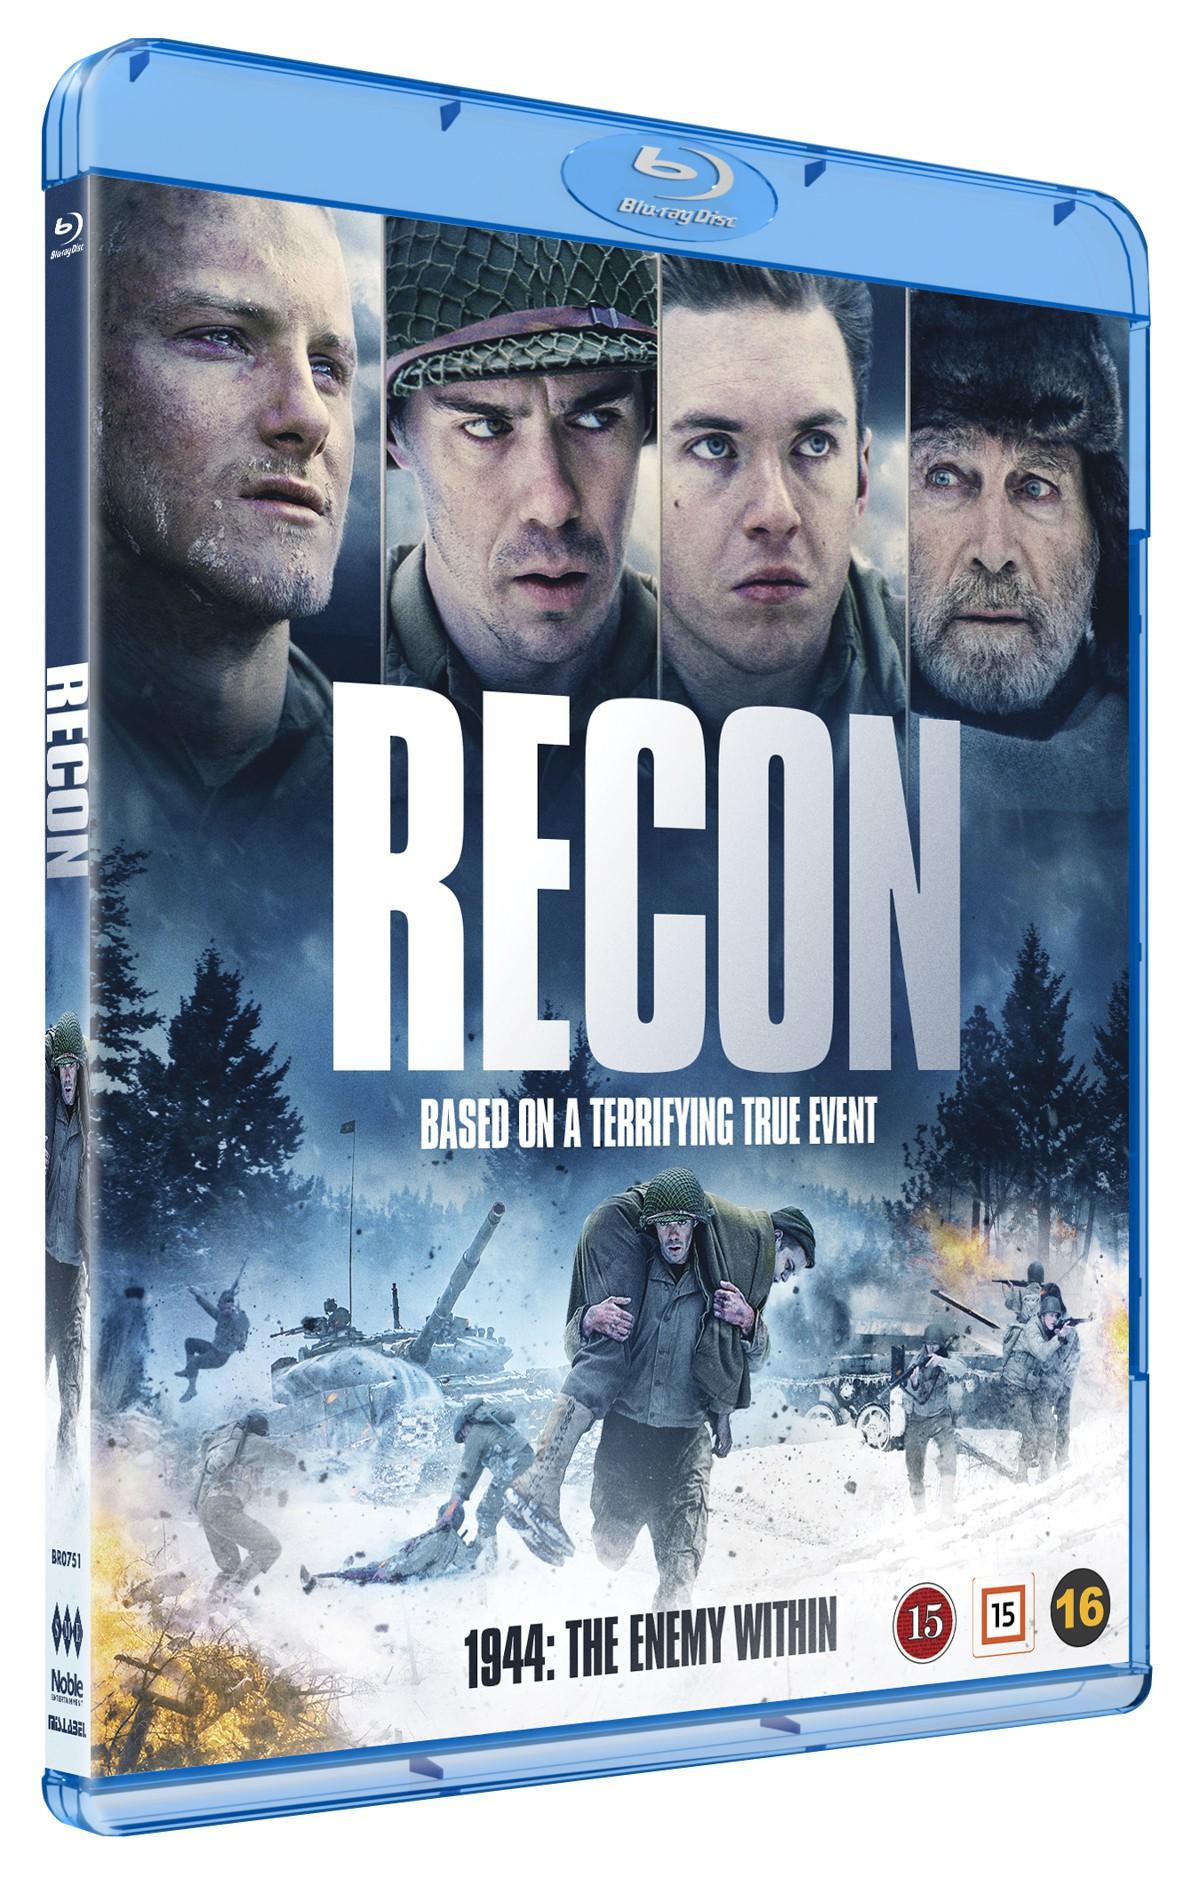 Recon - Alexander Ludwig - Film -  - 5705535066679 - September 13, 2021